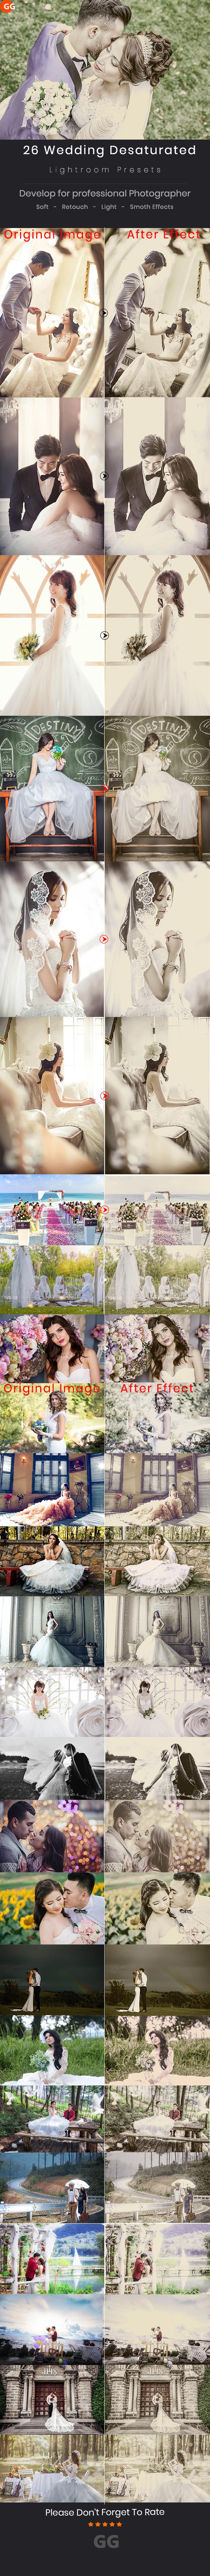 26 Wedding Desaturated Lightroom Preset - Wedding Lightroom Presets